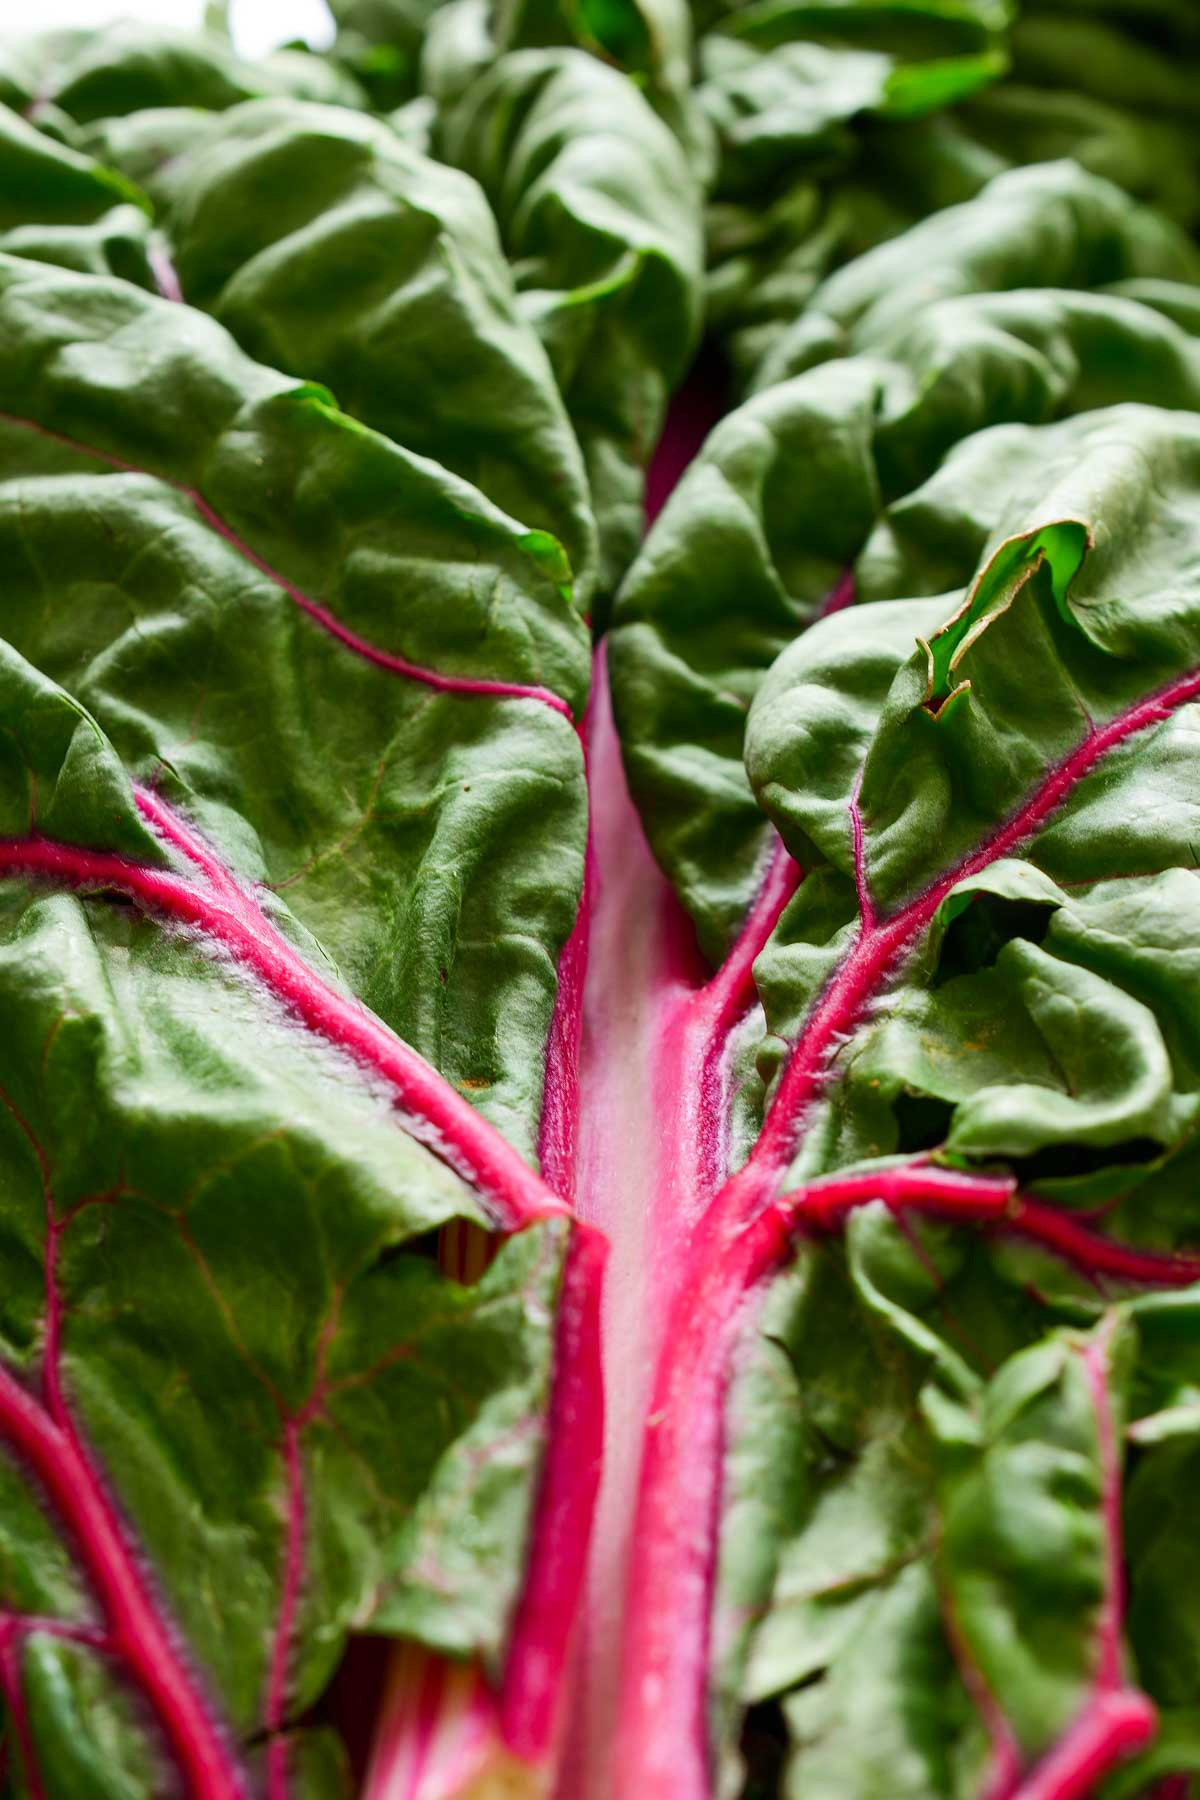 A close-up image of a pink Swiss chard leaf.